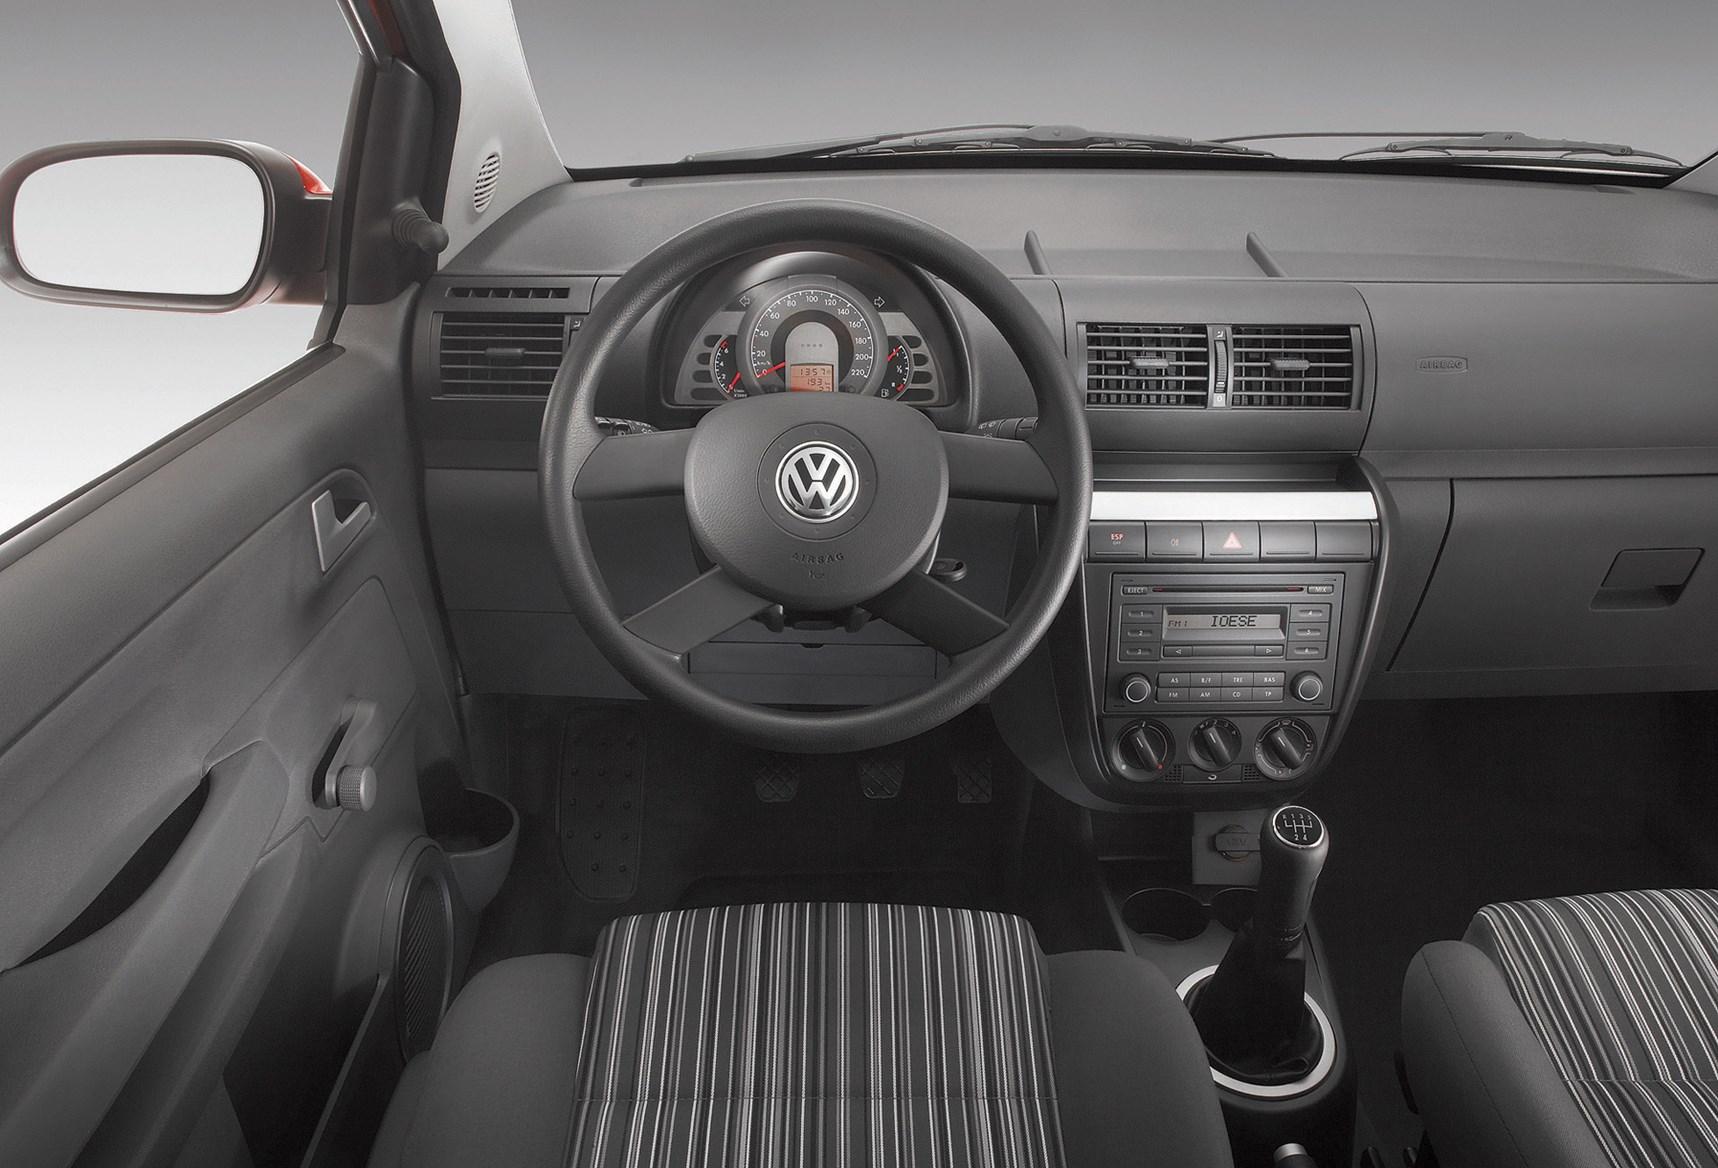 fox volkswagen urban interior vw 2006 hatchback parkers detail autocar much close rating